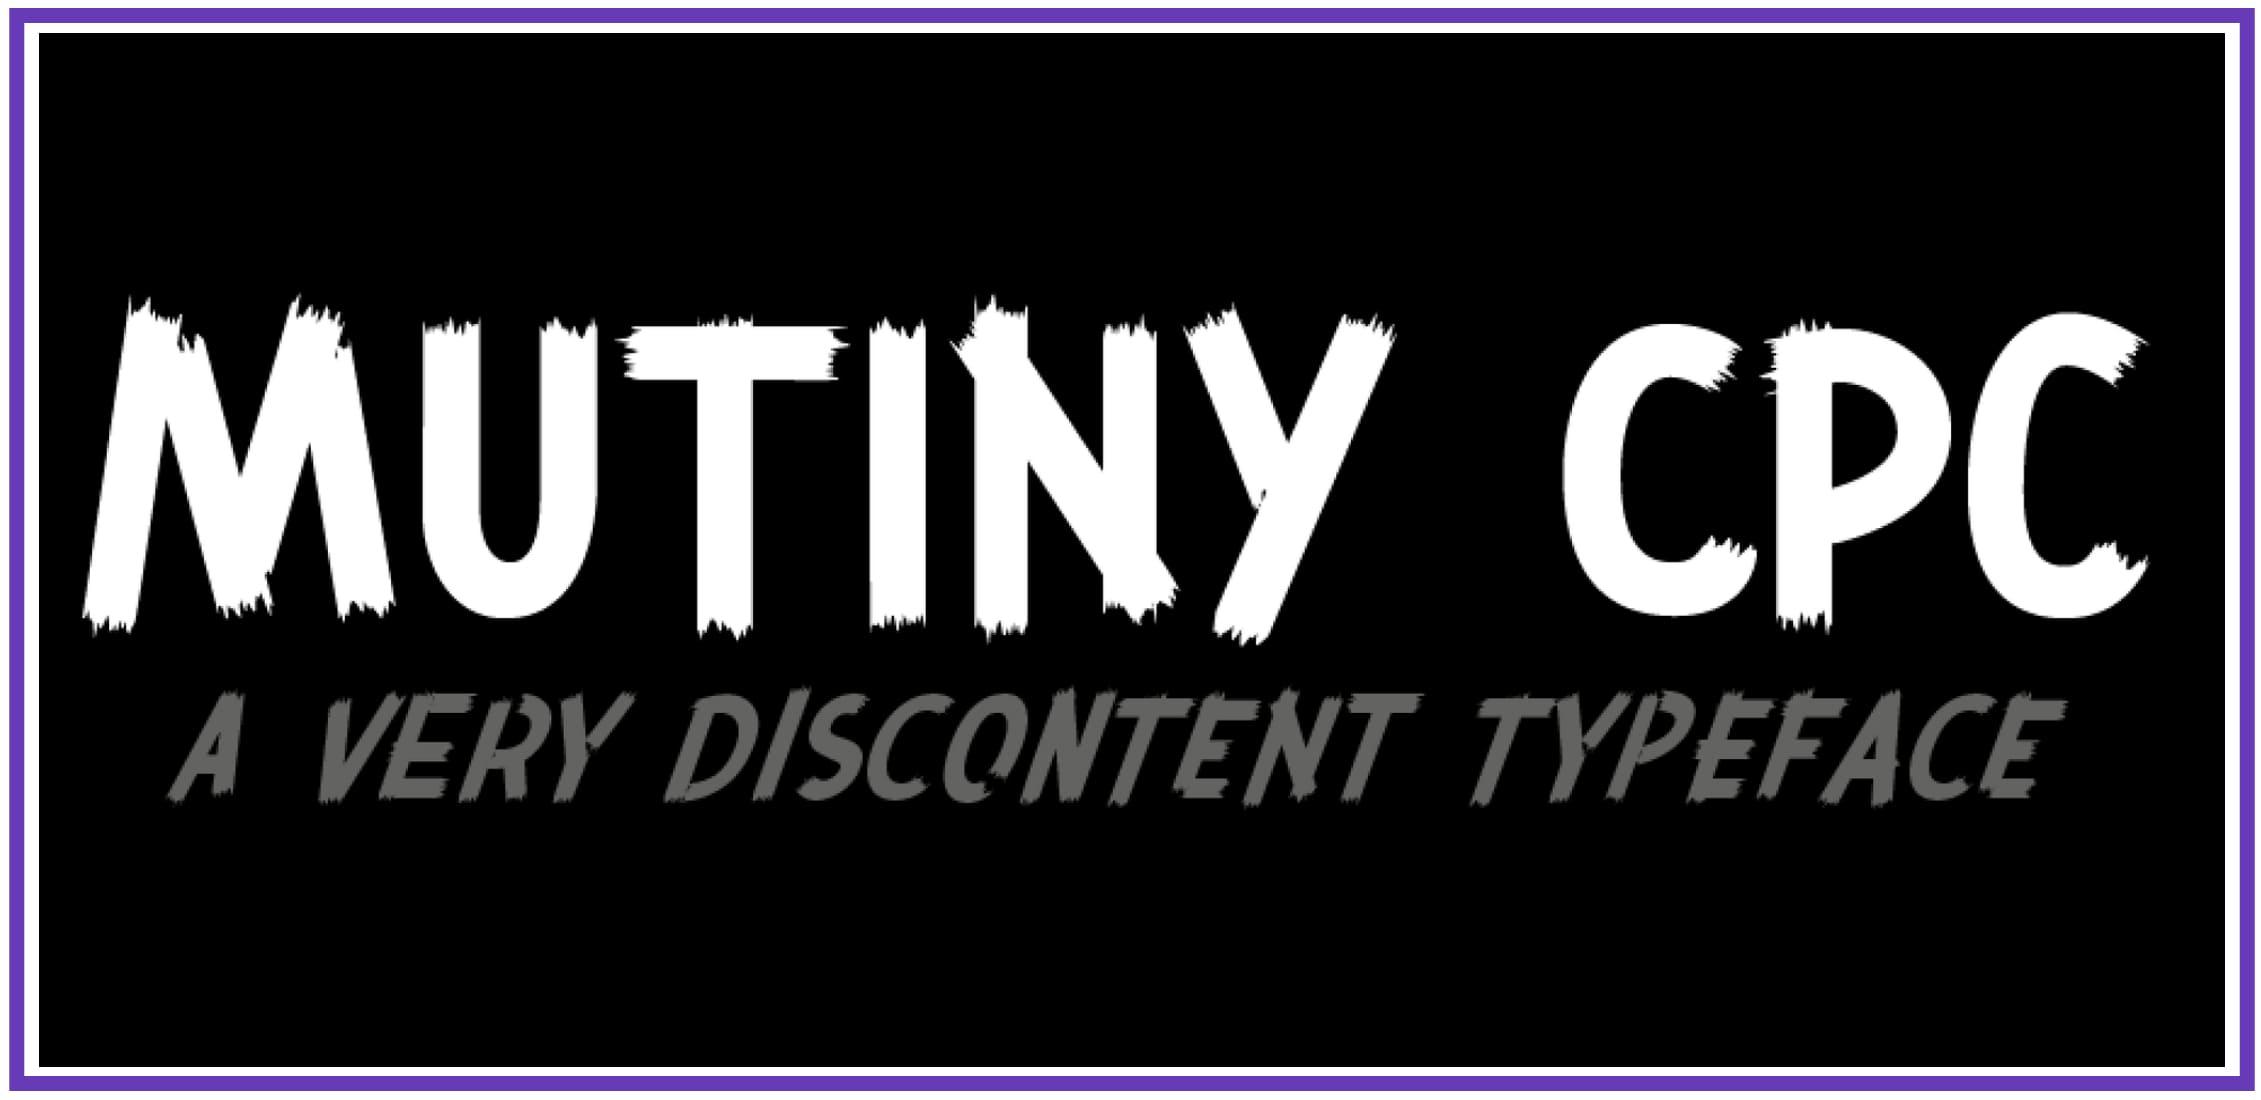 Spectacular Mutiny CPC. Punk Font.